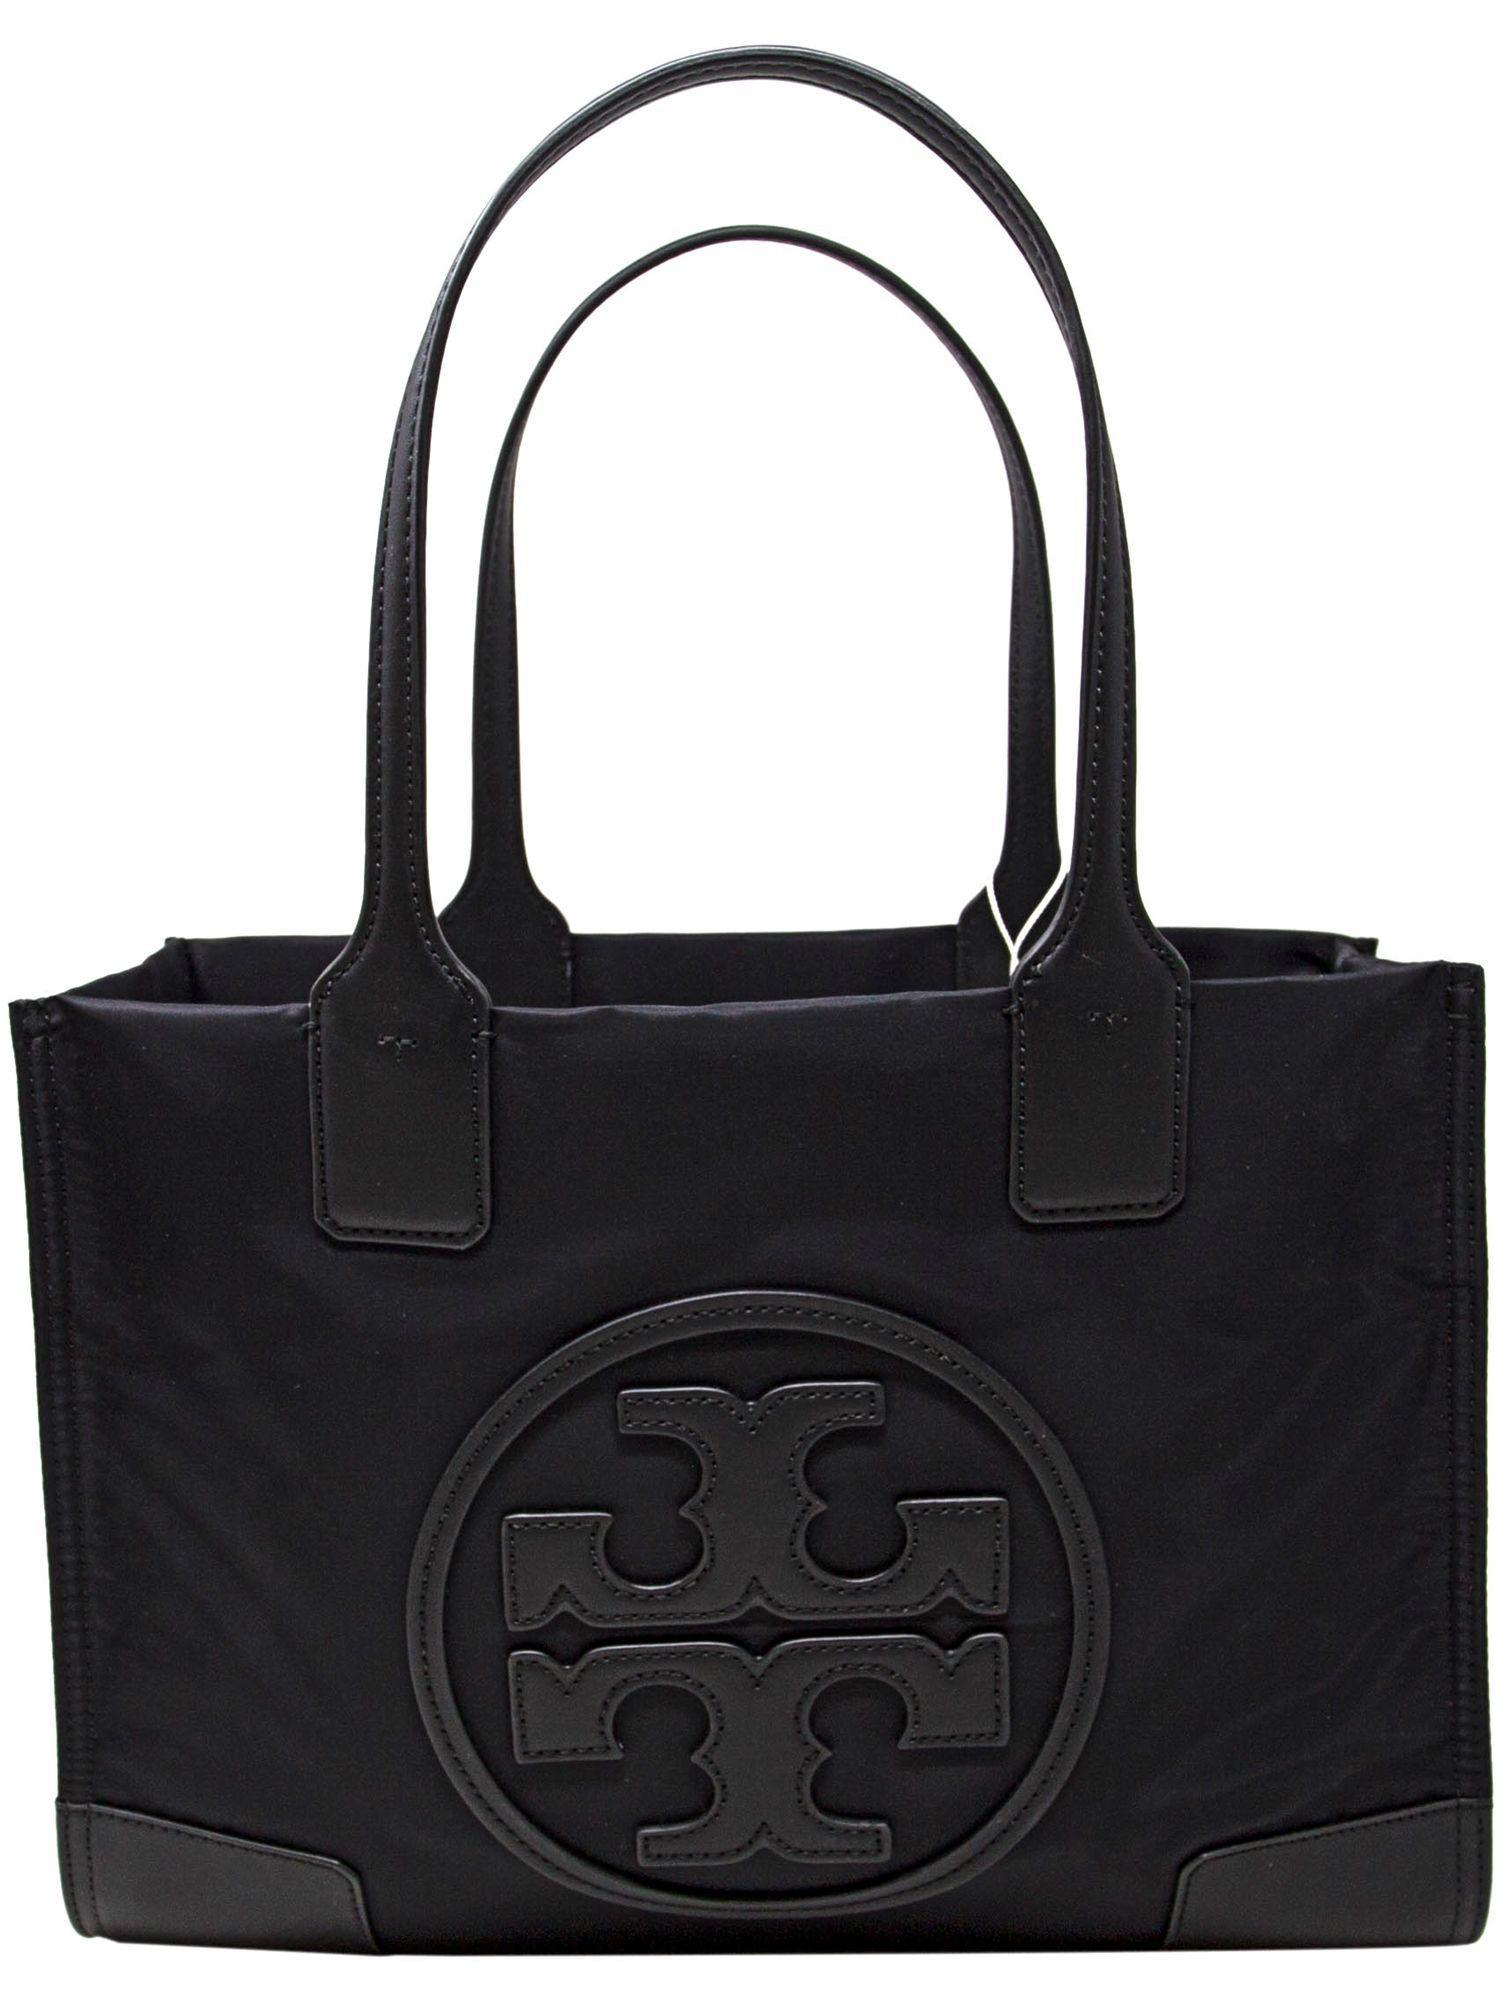 dde2150cda Lyst - Tory Burch Women s Mini Ella Nylon Top-handle Bag Tote in Black